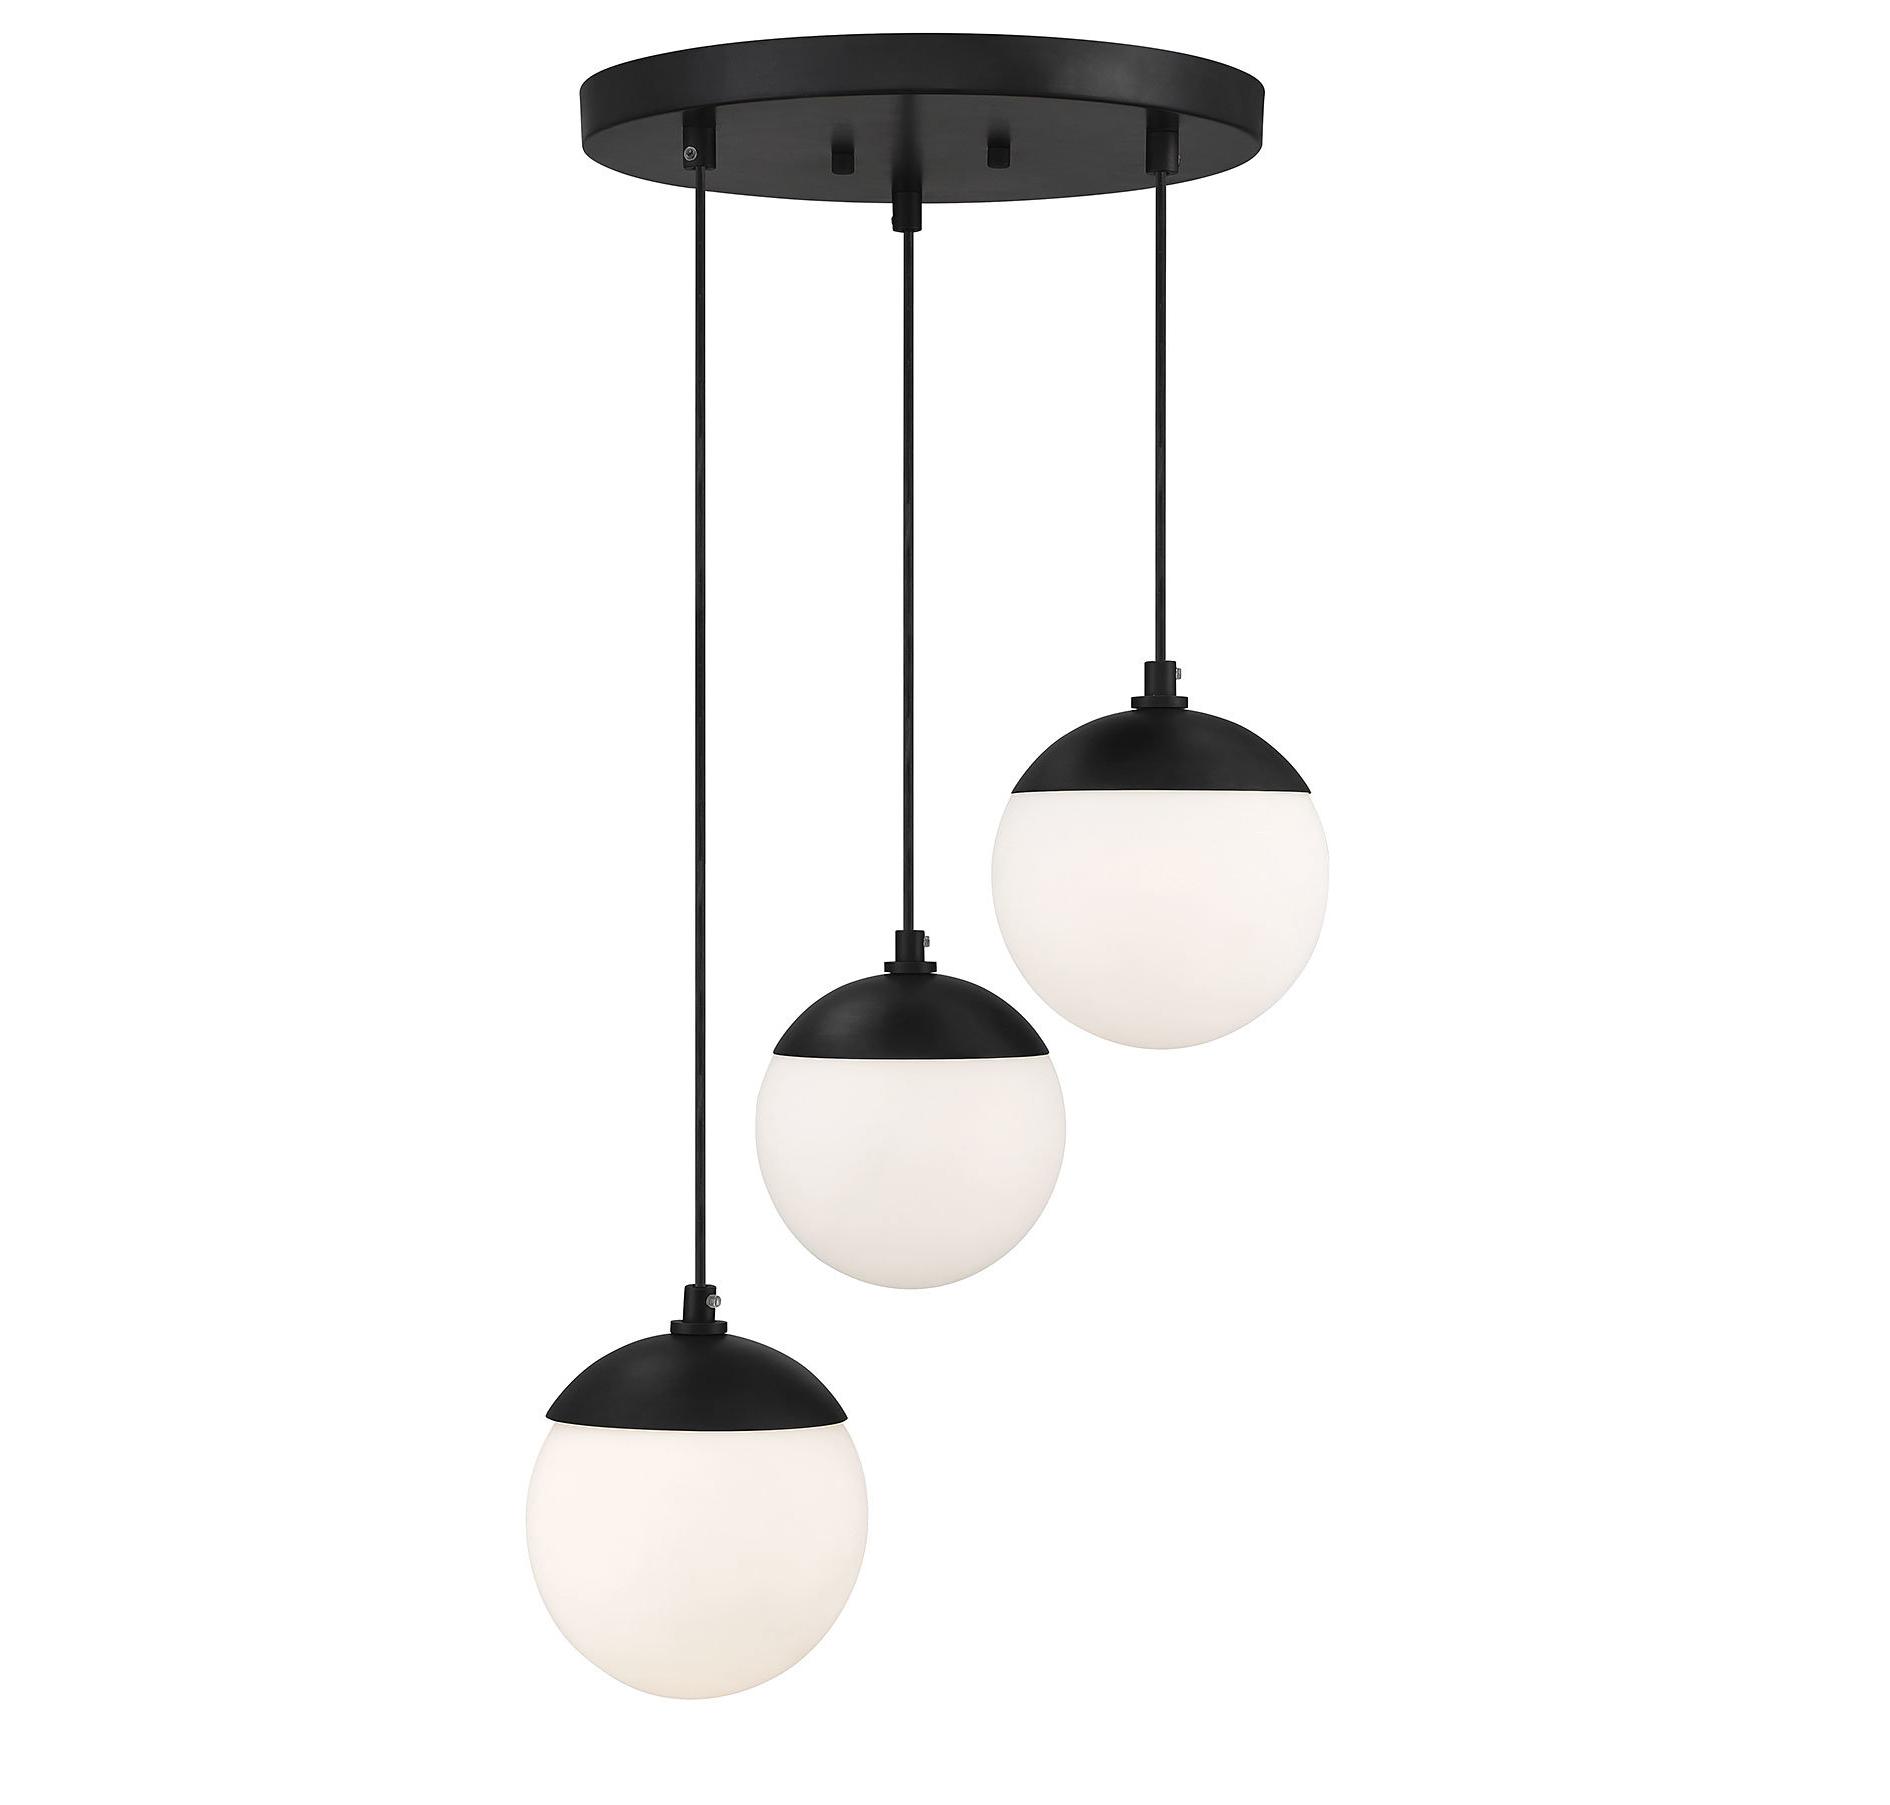 Bautista 1 Light Single Globe Pendants With Regard To 2020 Kara 3 Light Cluster Globe Pendant (View 8 of 20)